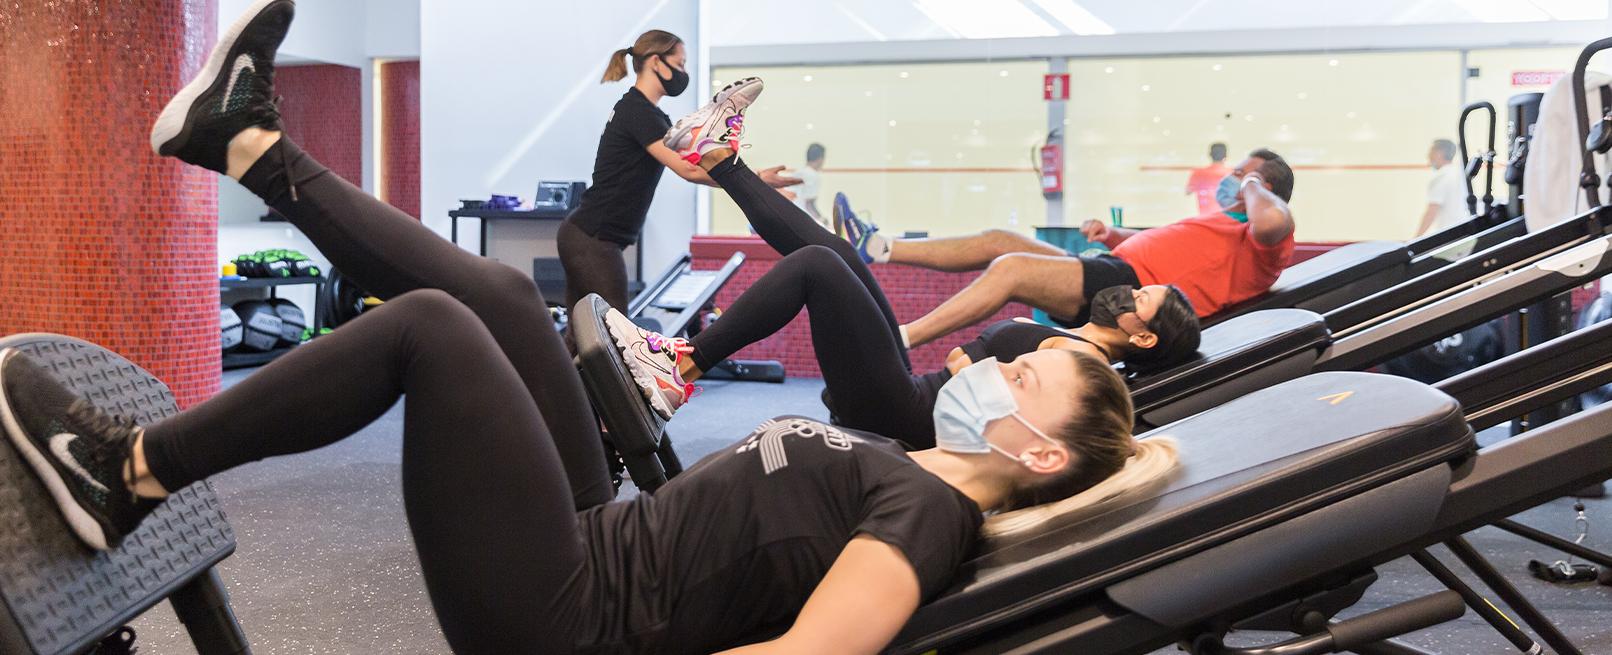 squash, padl, entrenamiento funcional